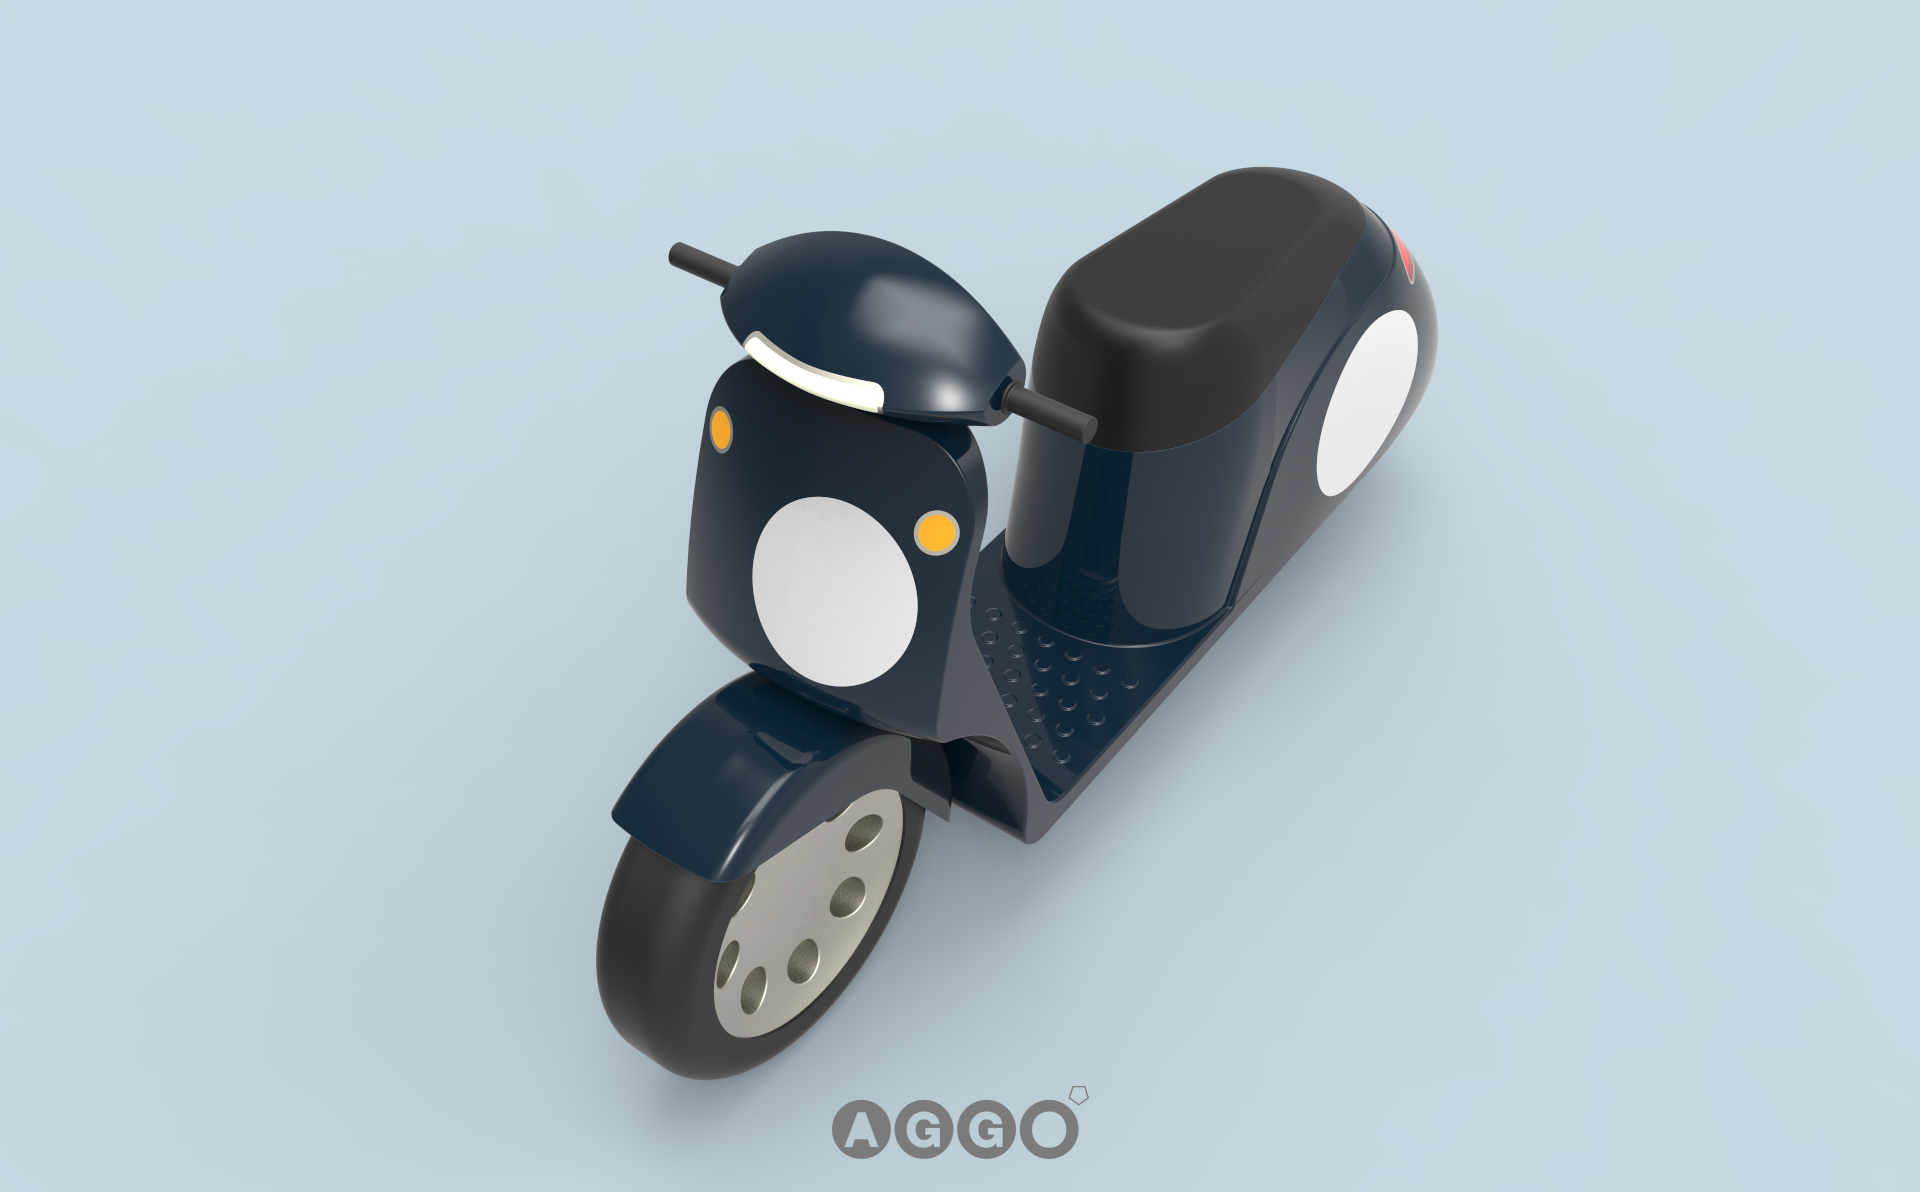 Electric_Bike_by_Aggo_006.jpg